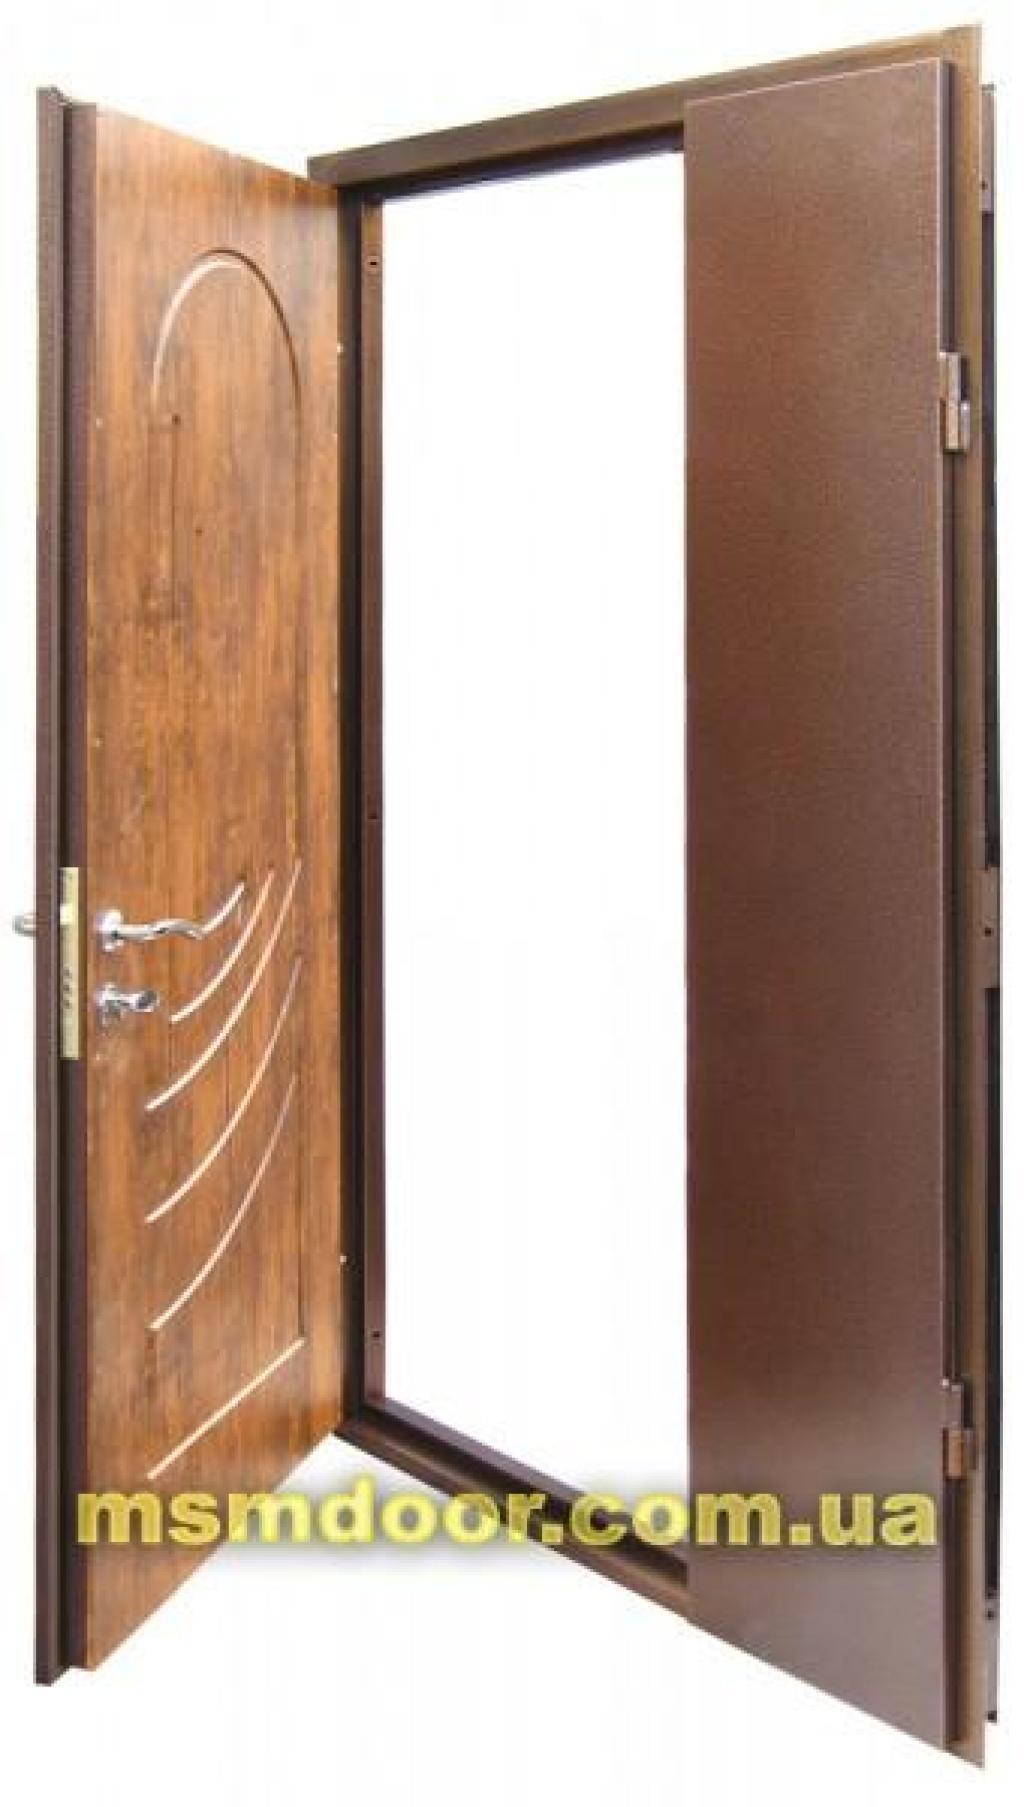 двустворчатые металлические двери от производителя